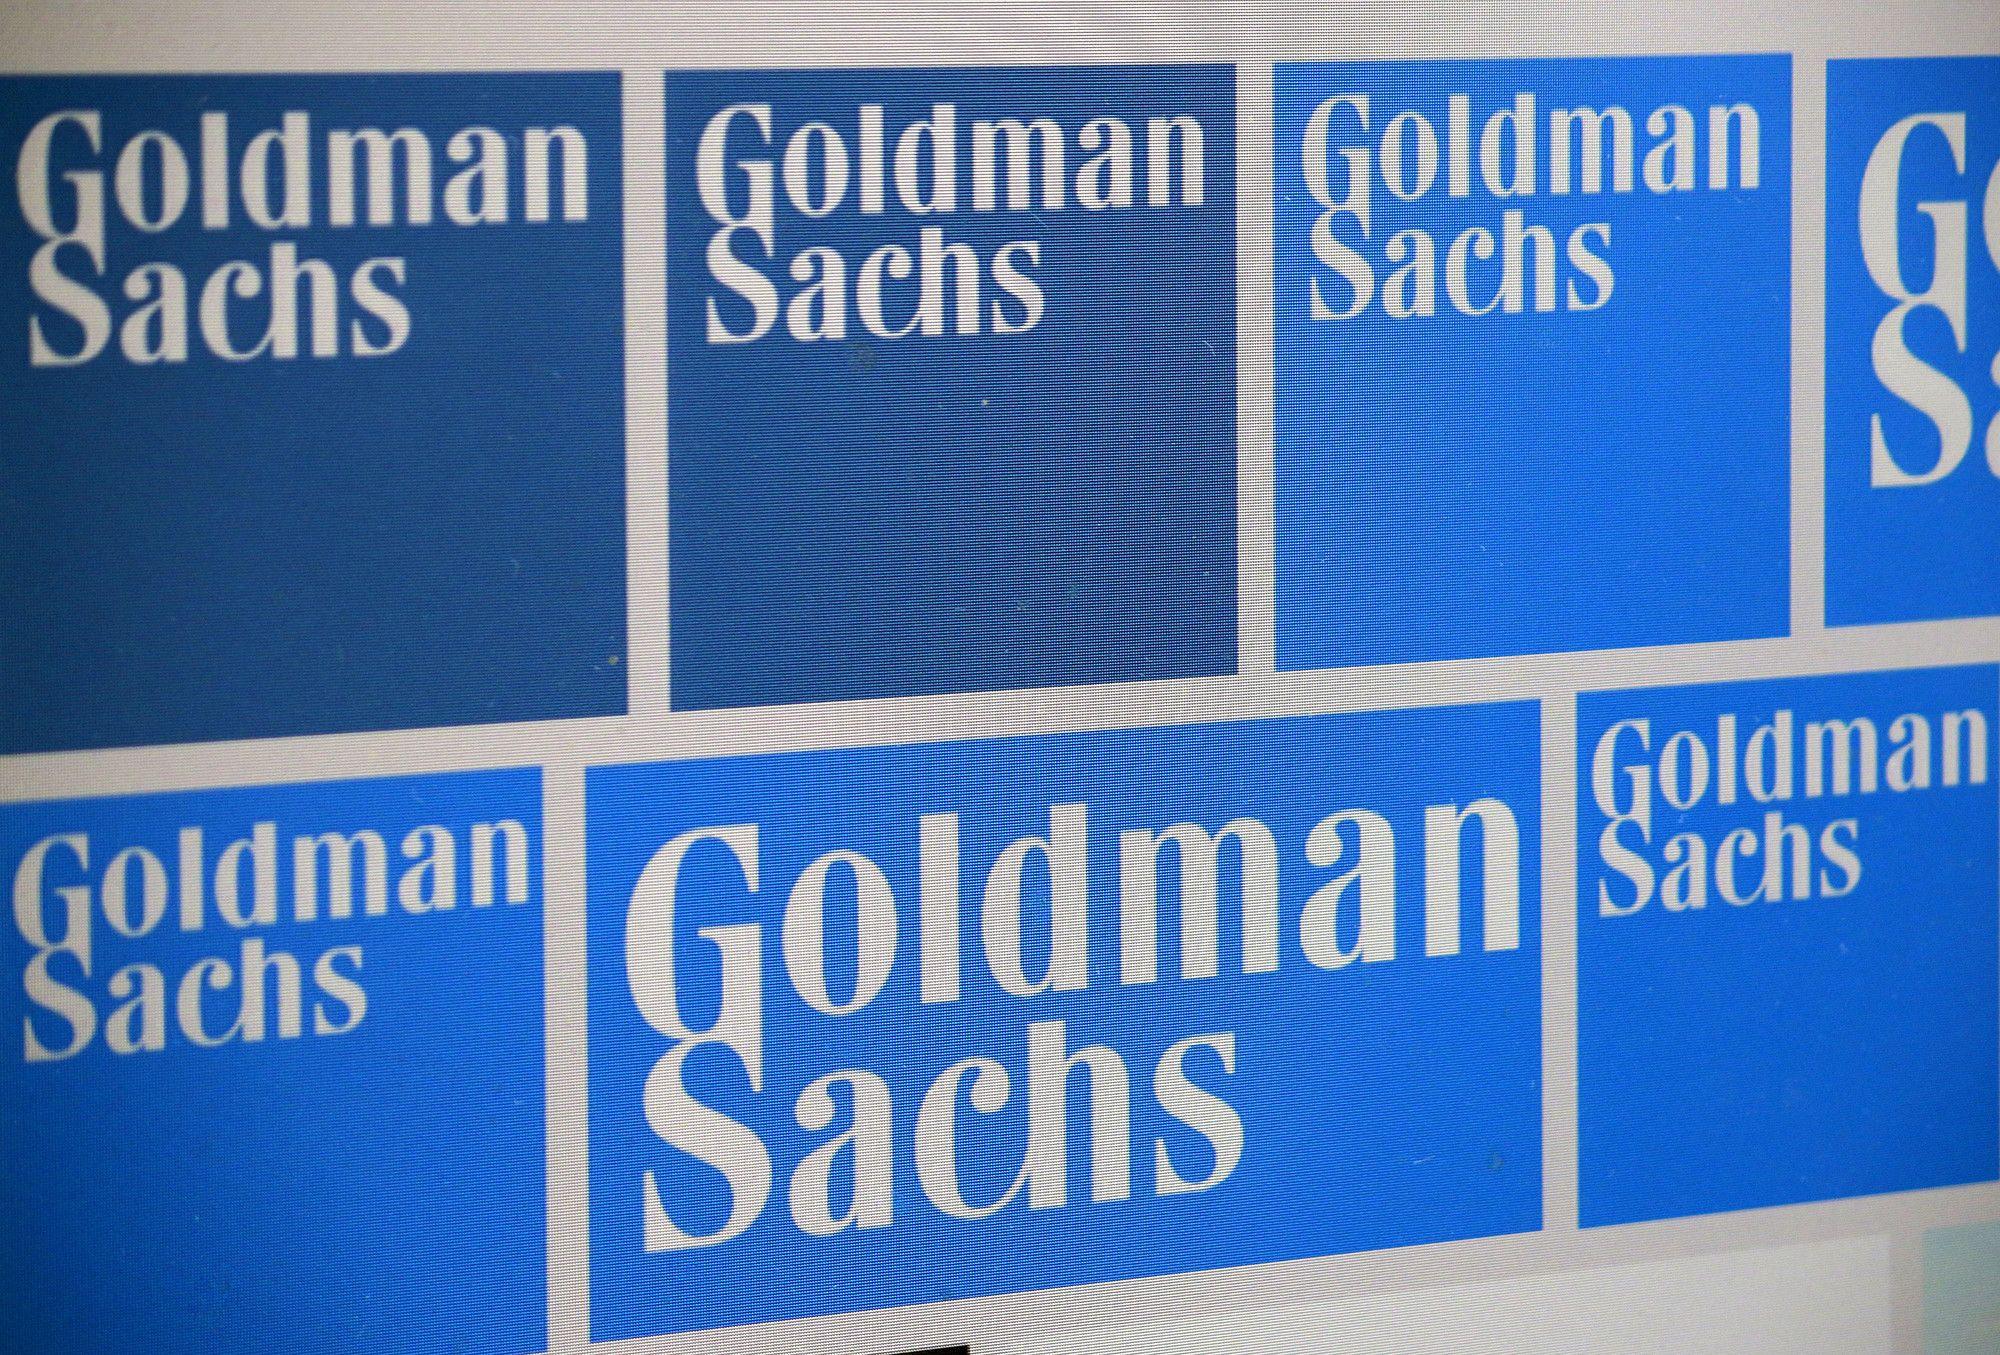 Goldman sachs partner hit with lifetime banking ban in